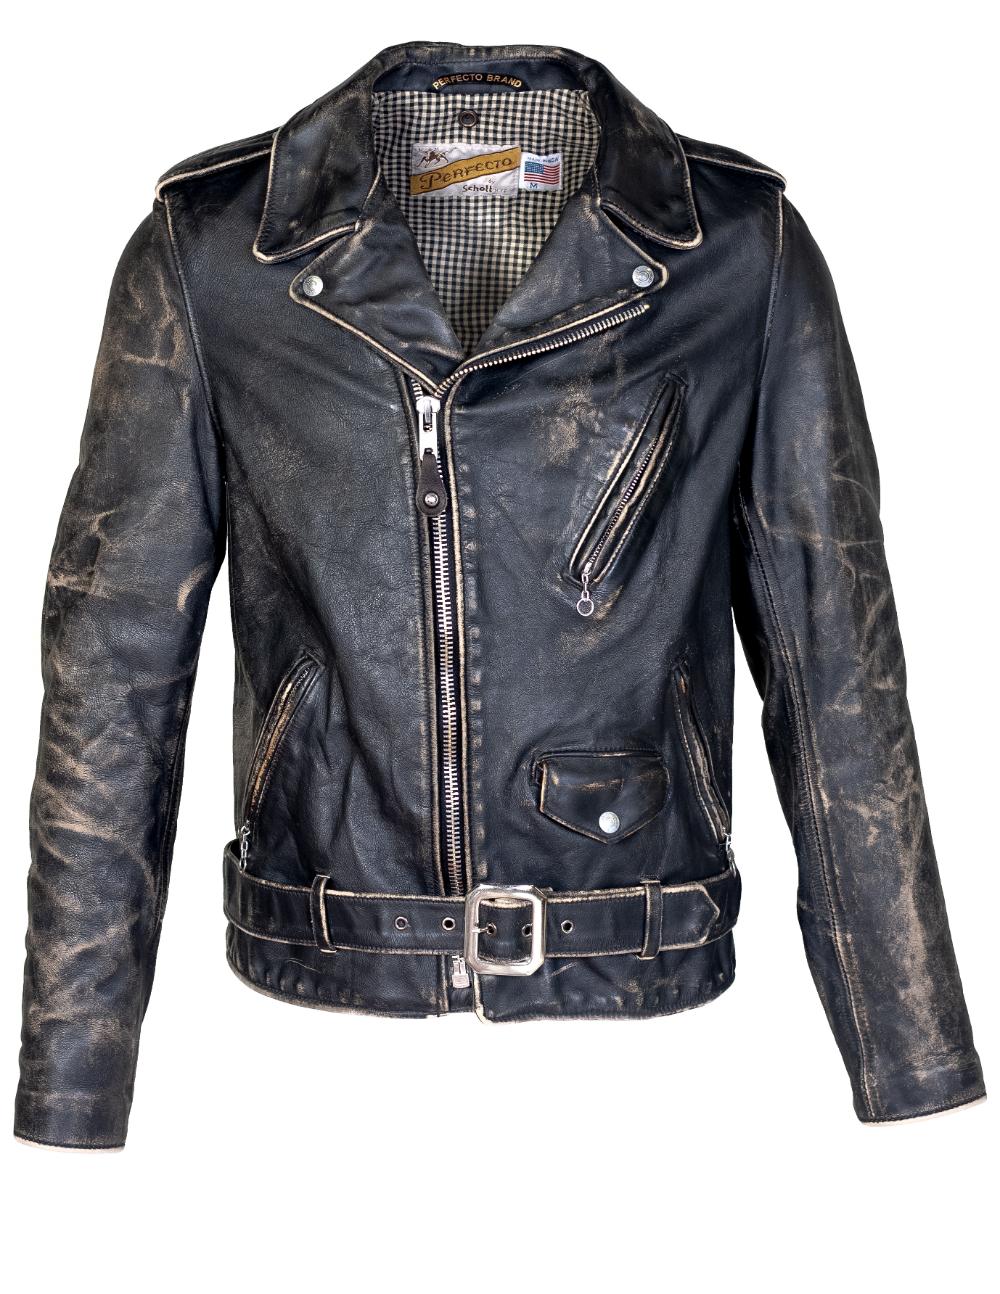 Schott Per70 Used Google Search Leather Jacket Men Motorcycle Jacket Vintage Leather Jacket [ 1294 x 1000 Pixel ]